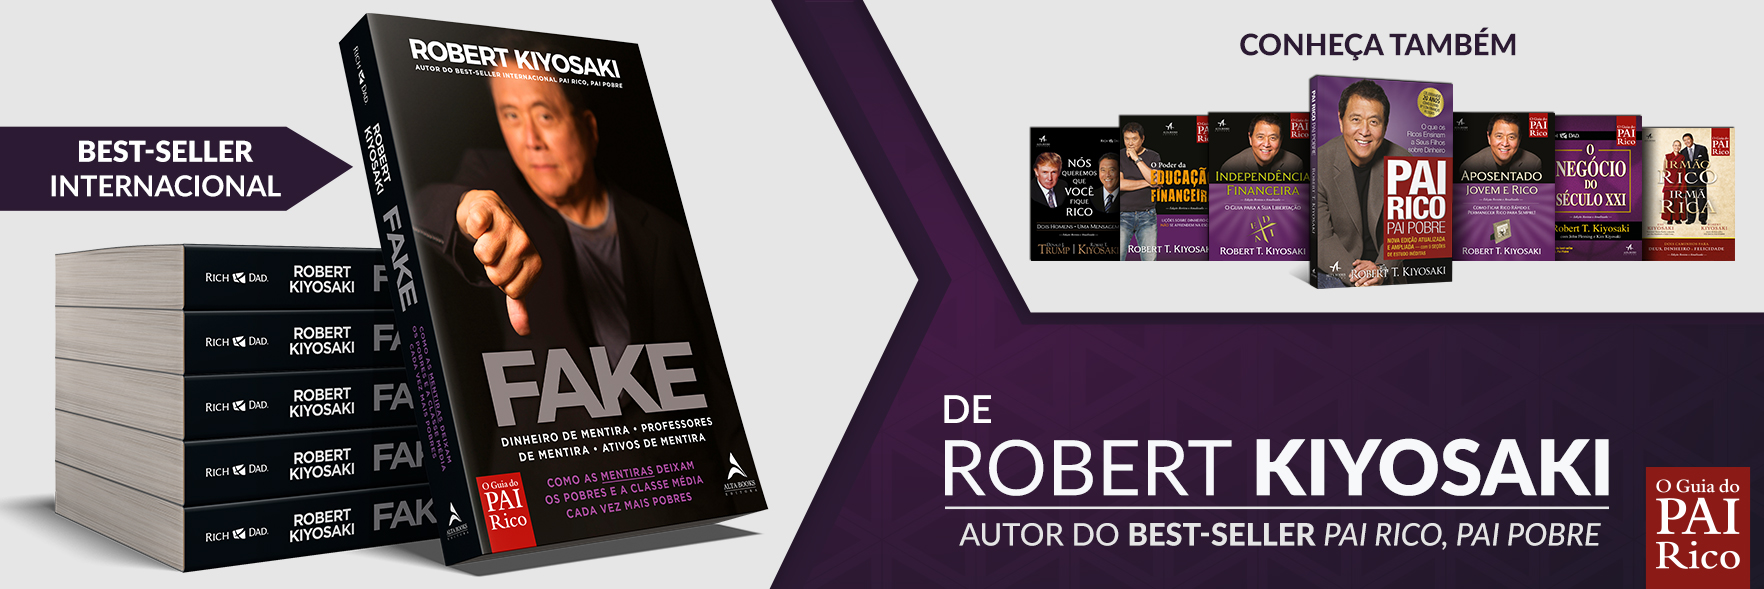 Banner do livro Fake